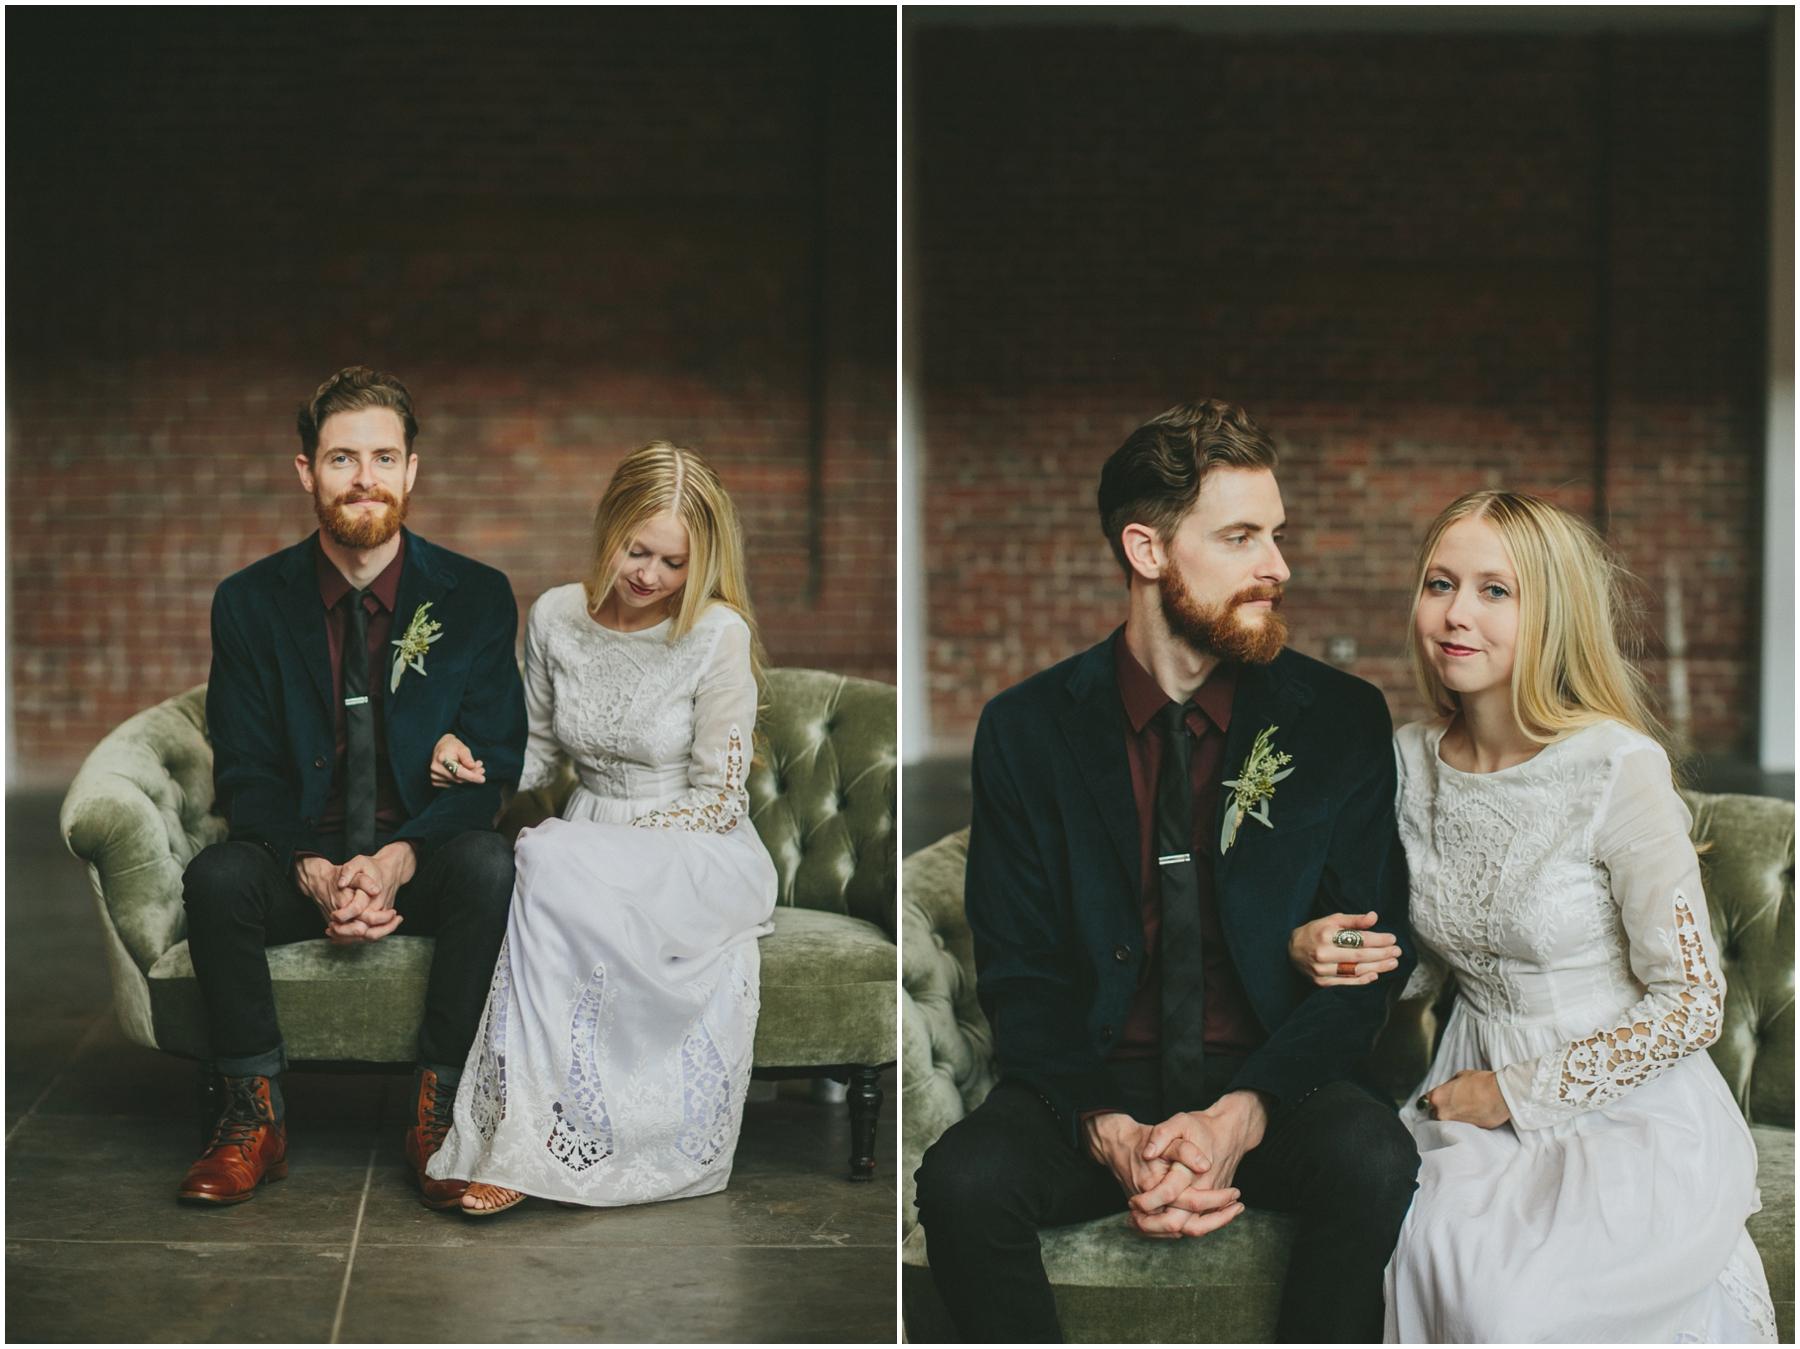 Natalie+Corey-WEDDING_KELLYBOITANO_0049